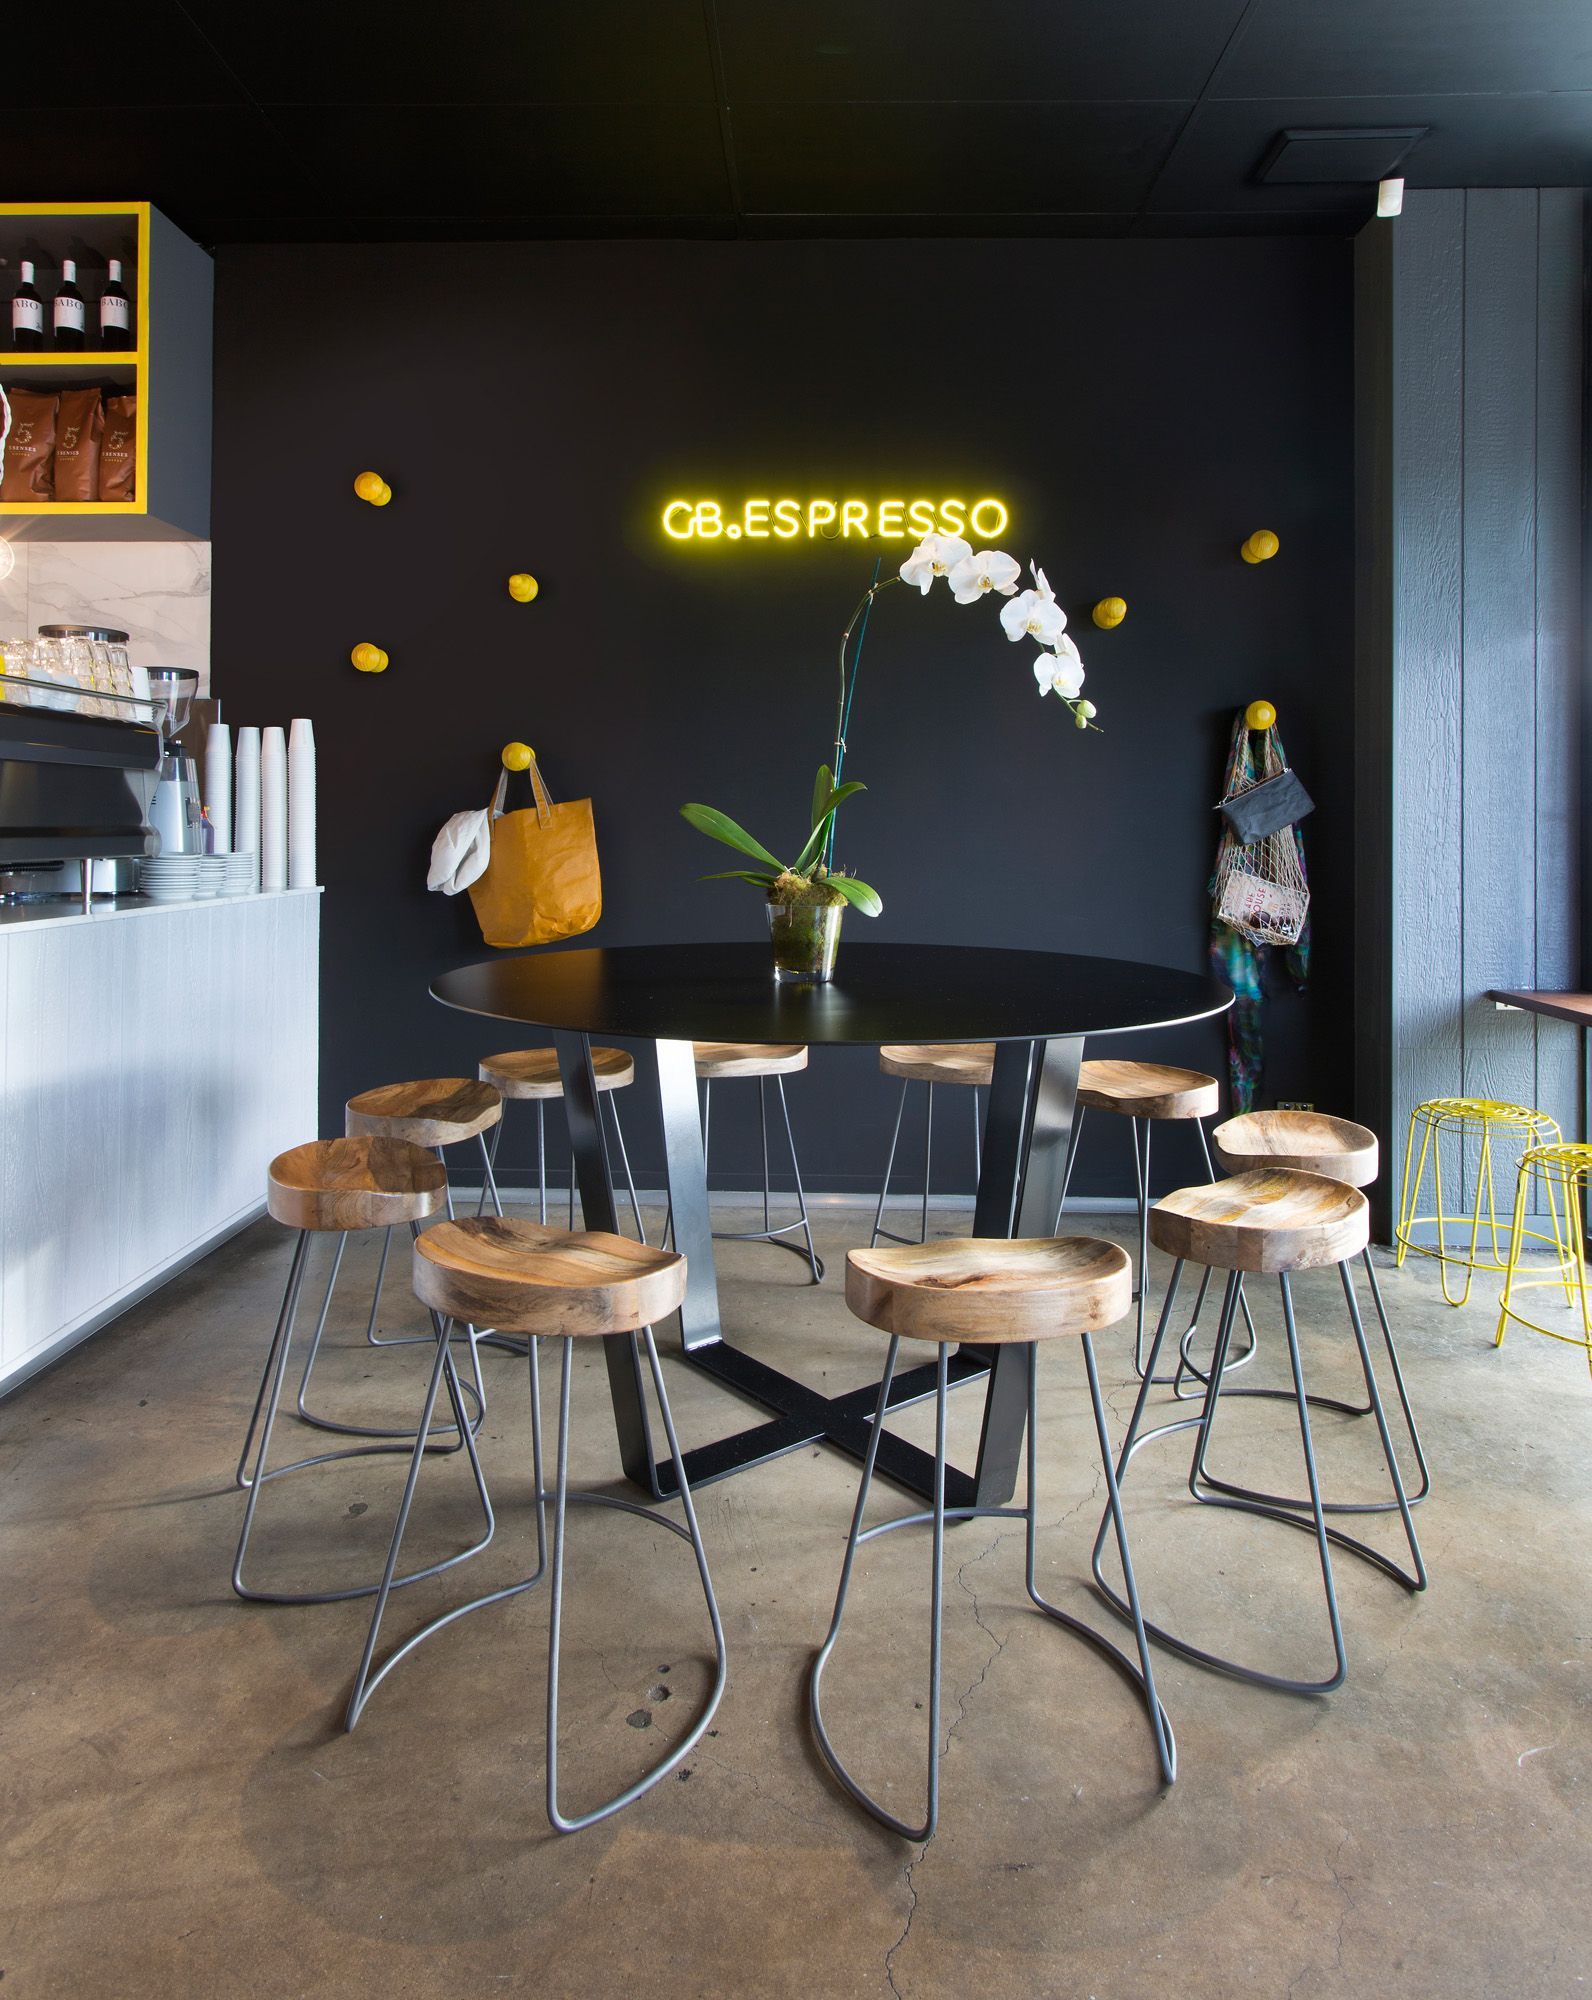 Gb espresso cafe mr mitchell cafe interior design for Comedores almacenes paris